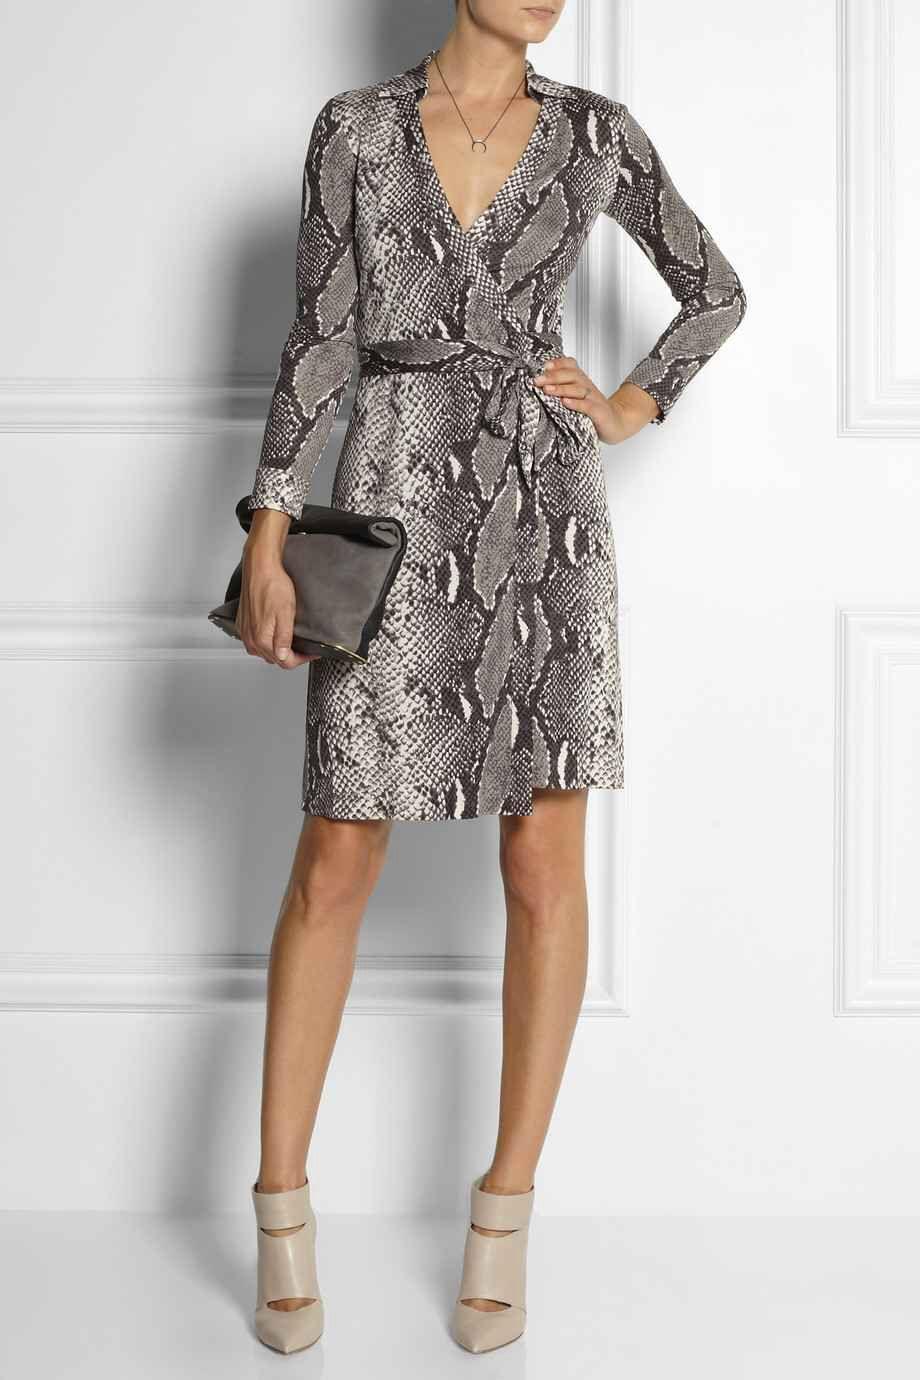 stampa pitone, moda primavera 2019